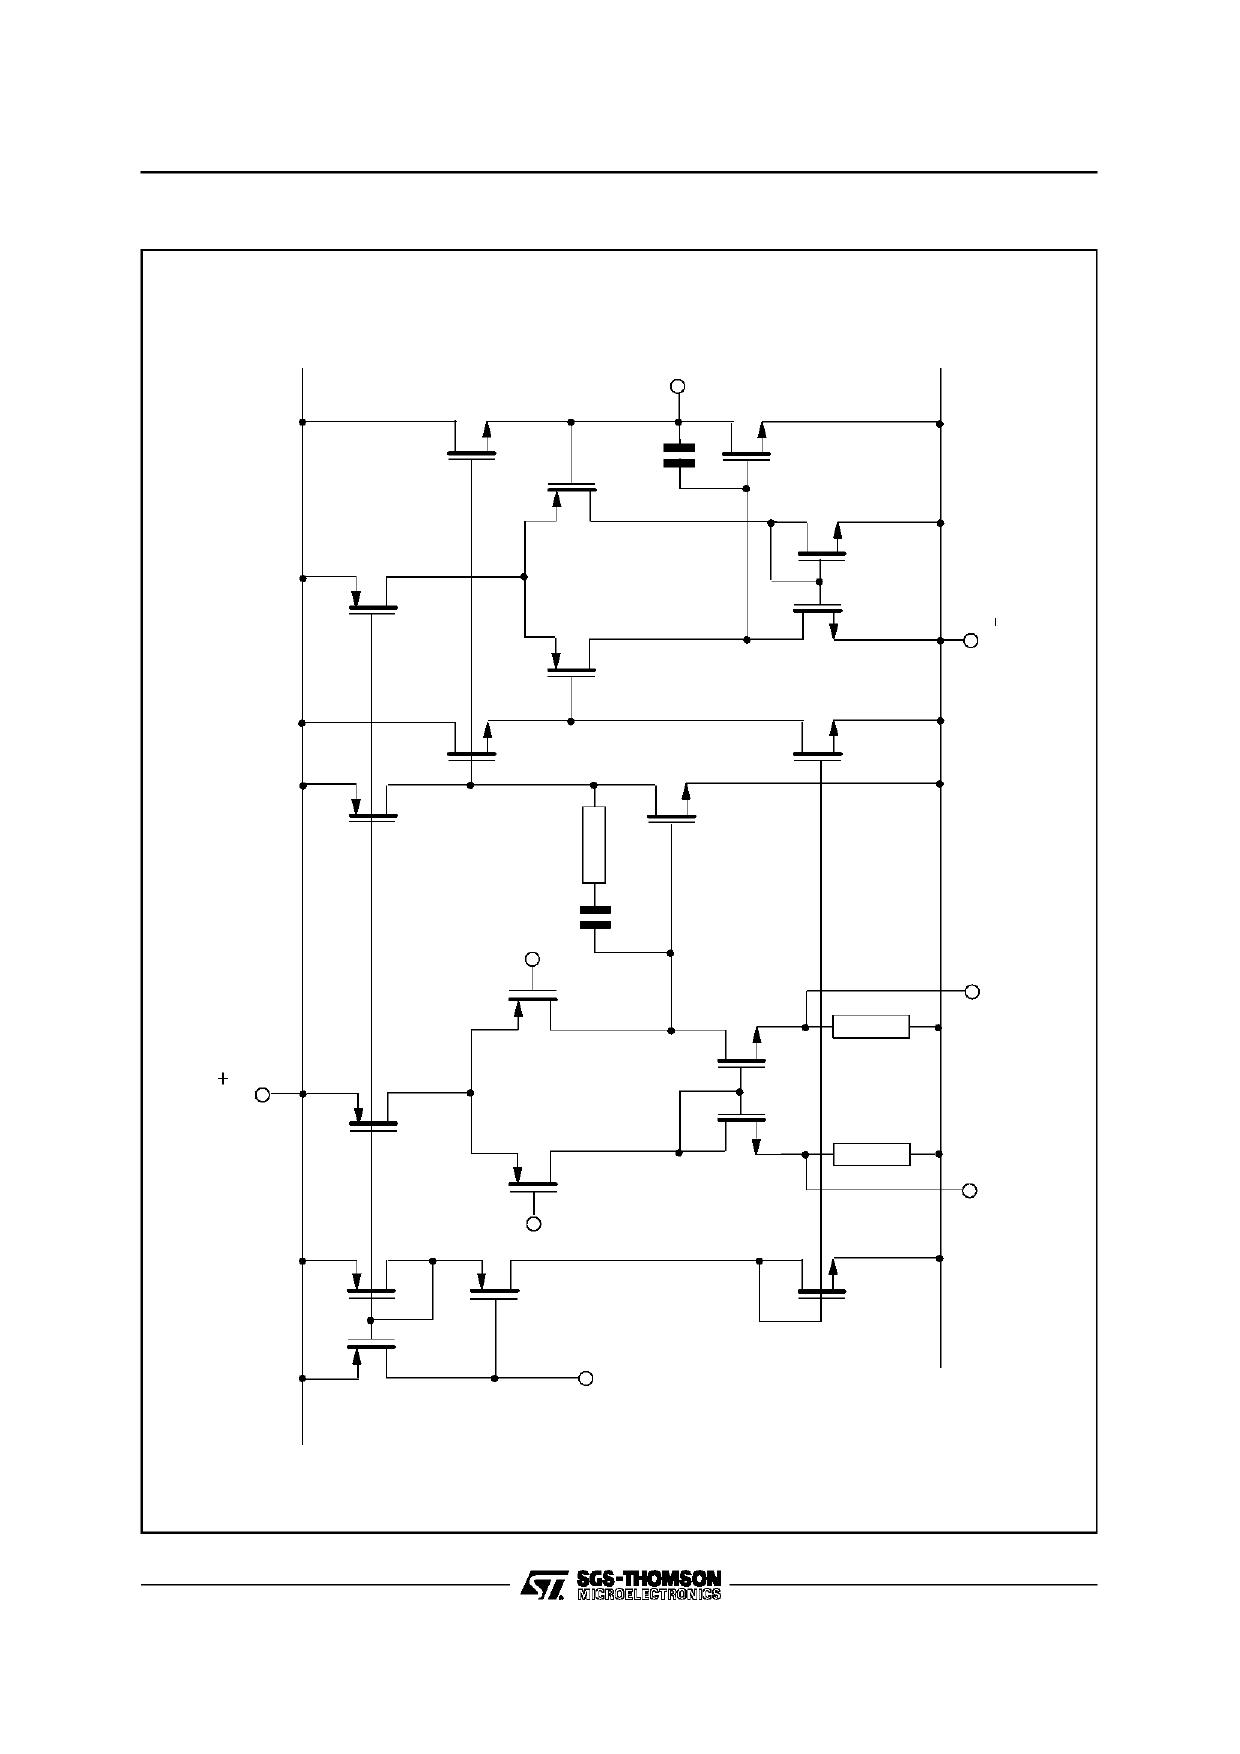 TS271M pdf, ピン配列